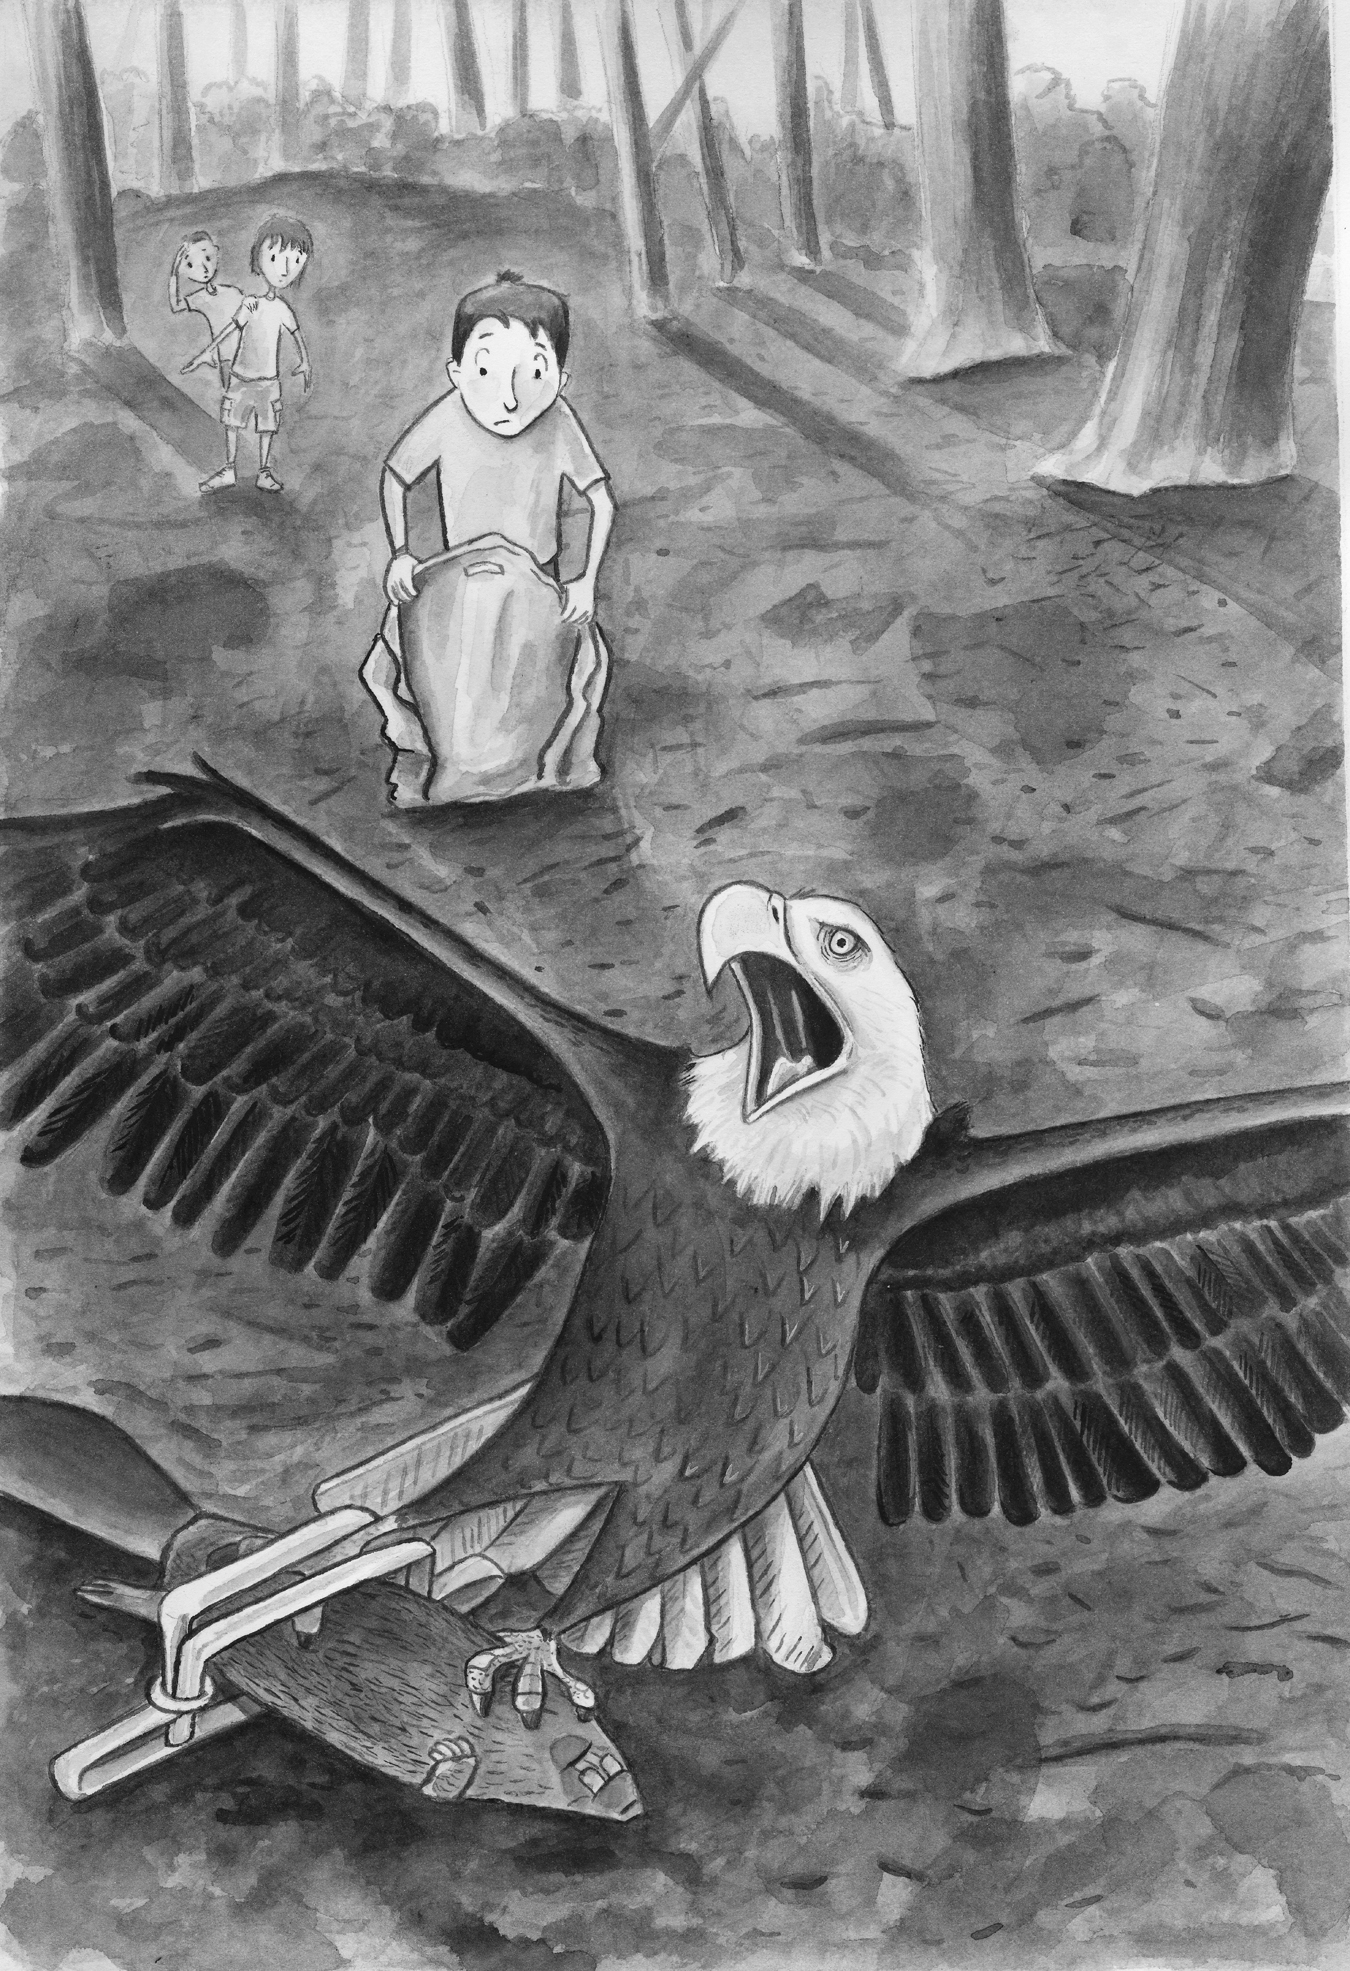 17_Eagles Nest_ed_size copy.jpg